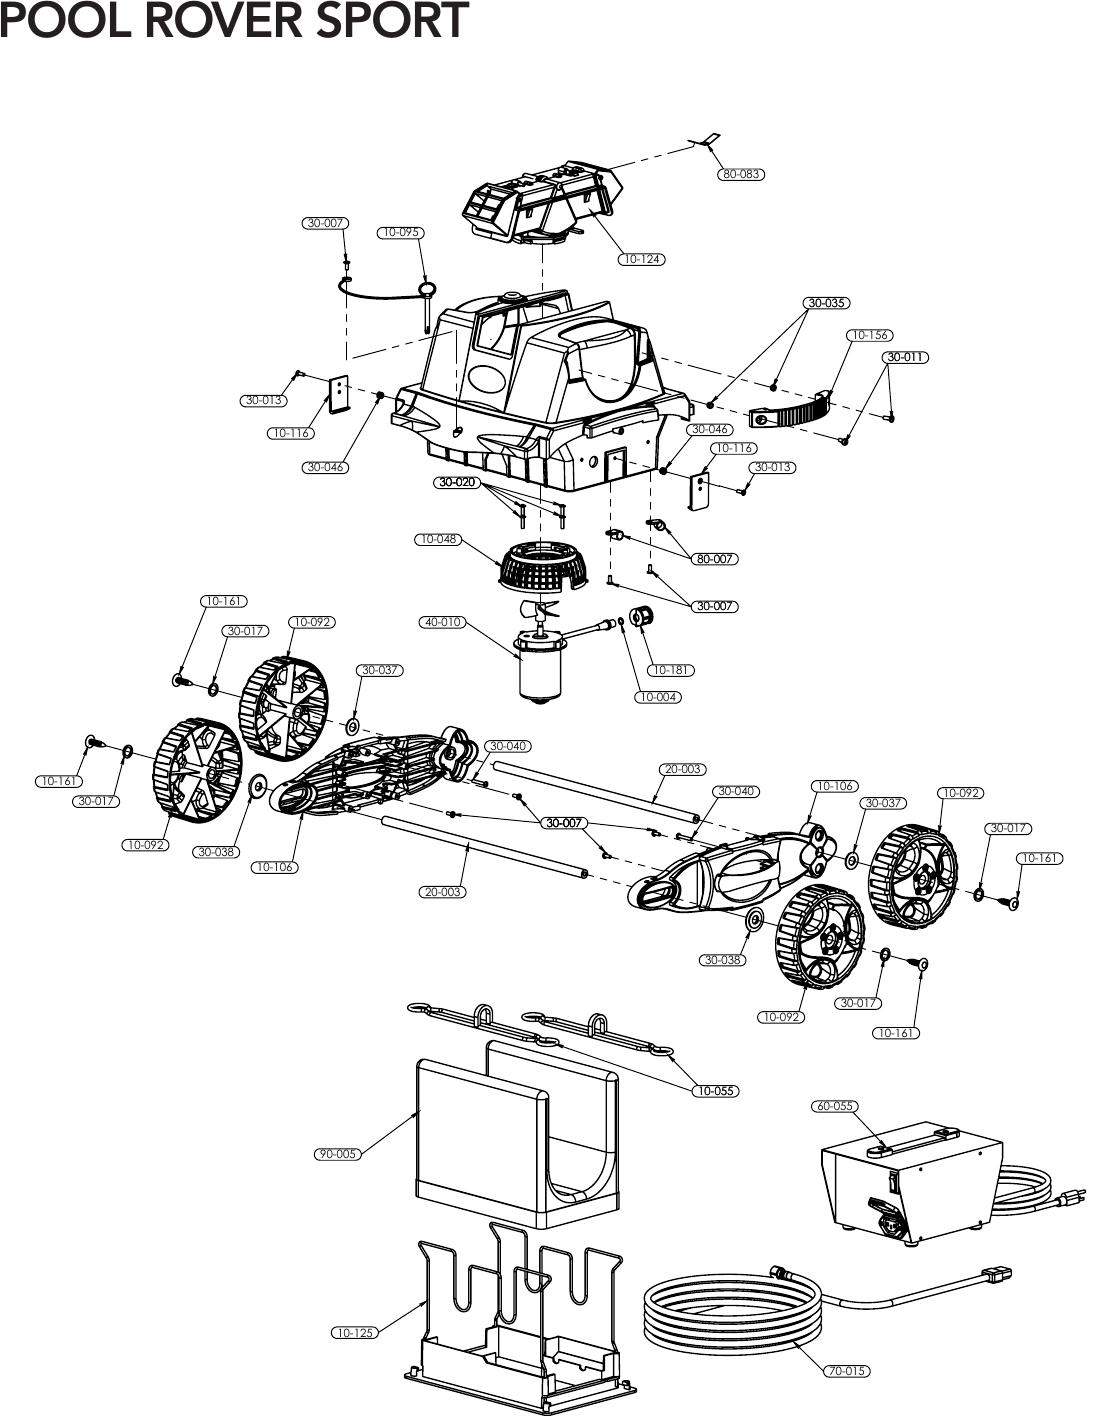 hight resolution of aquabot pool rover sport parts